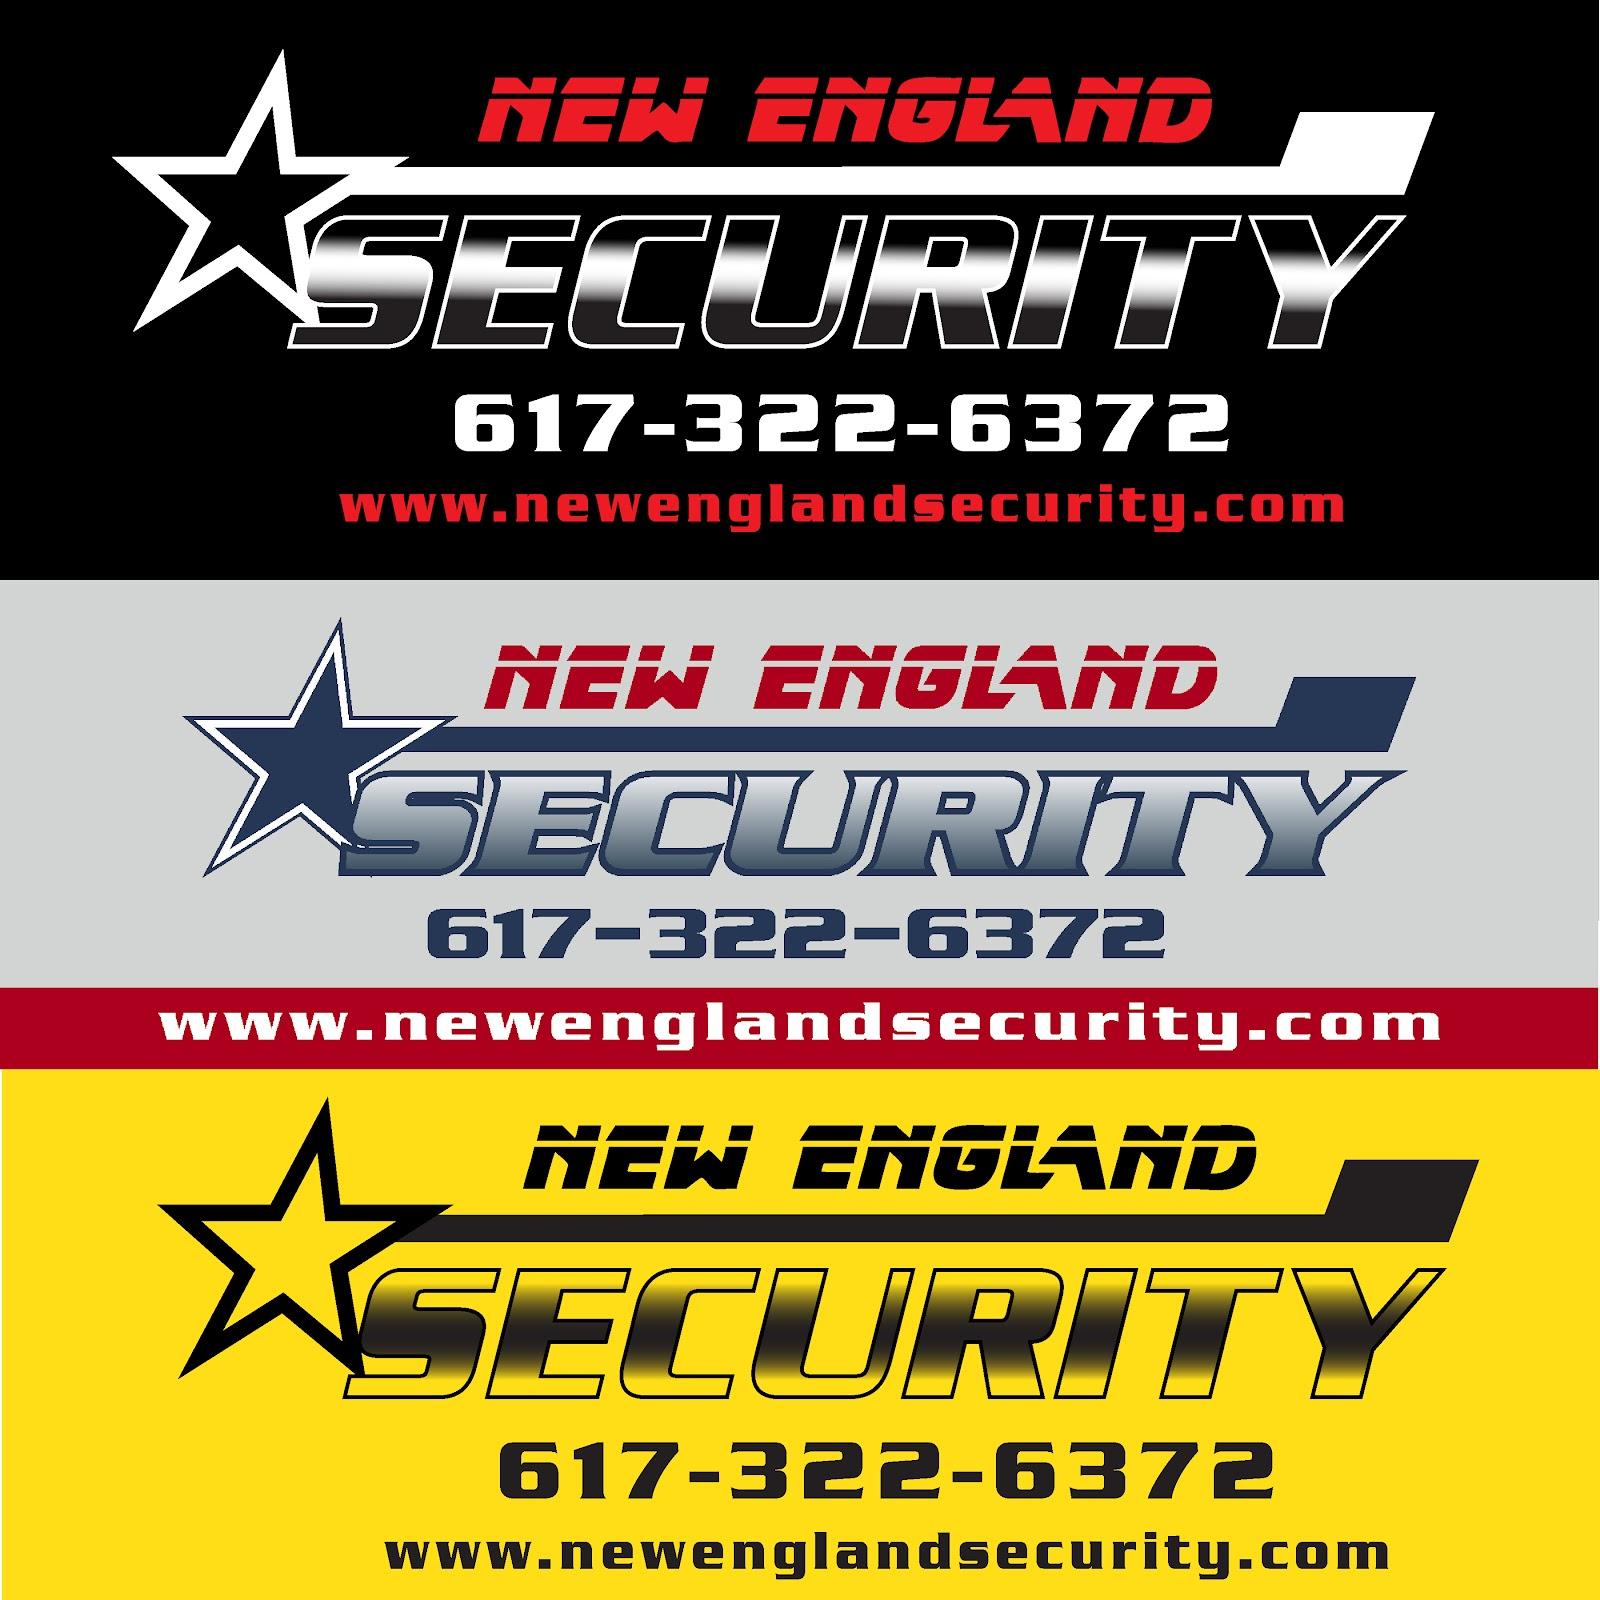 New England Security Team Photos Security Services New